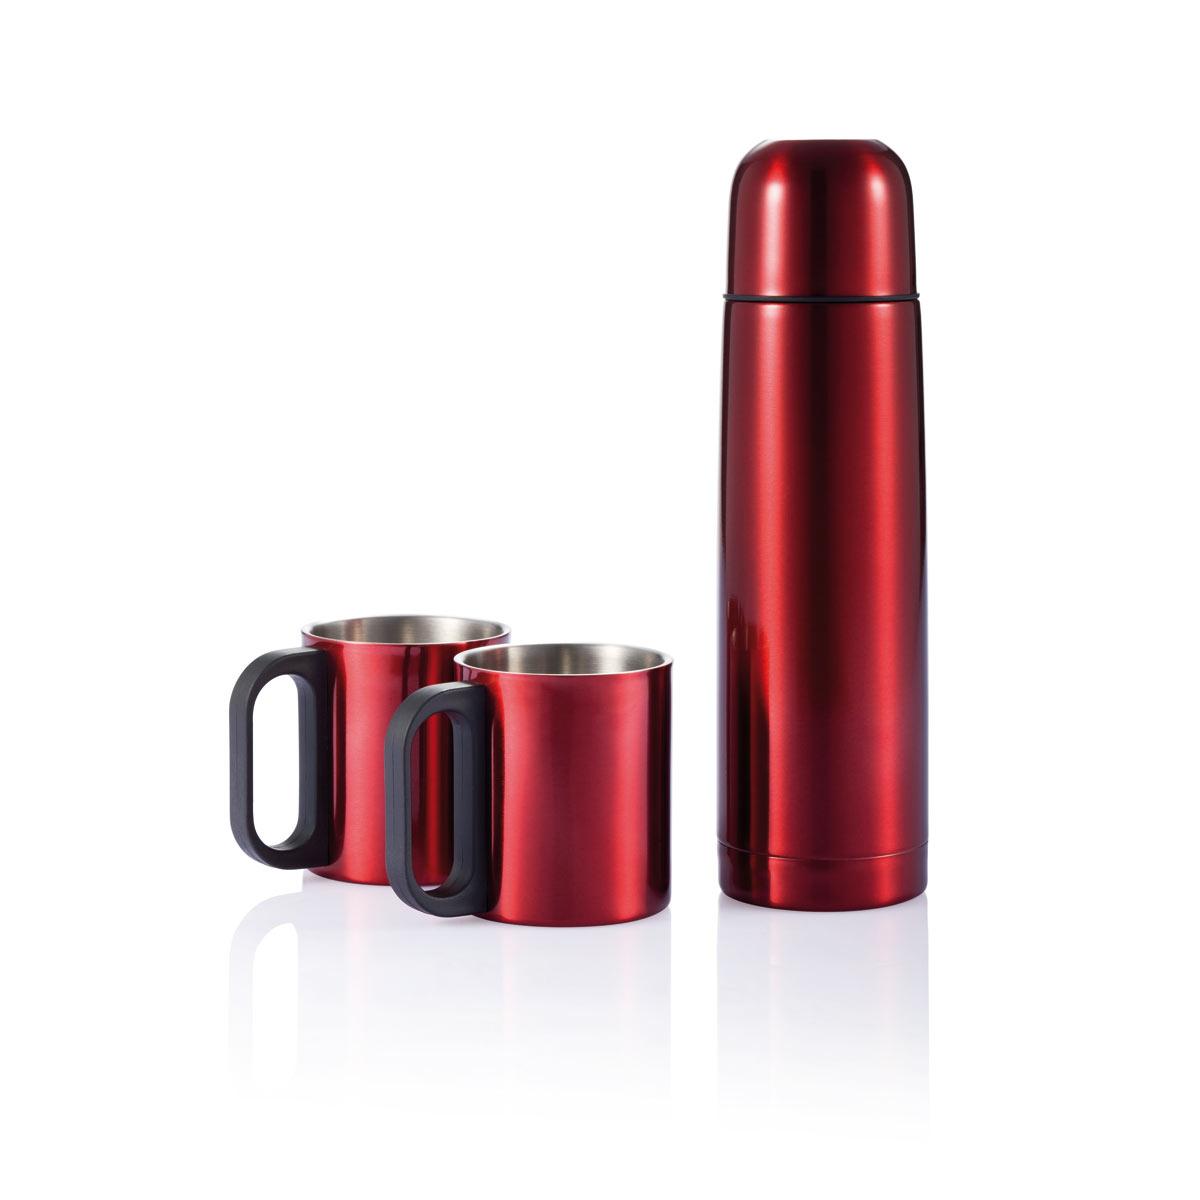 sac bouteille publicitaire mug isotherme bouteille publicitaire mug inox. Black Bedroom Furniture Sets. Home Design Ideas